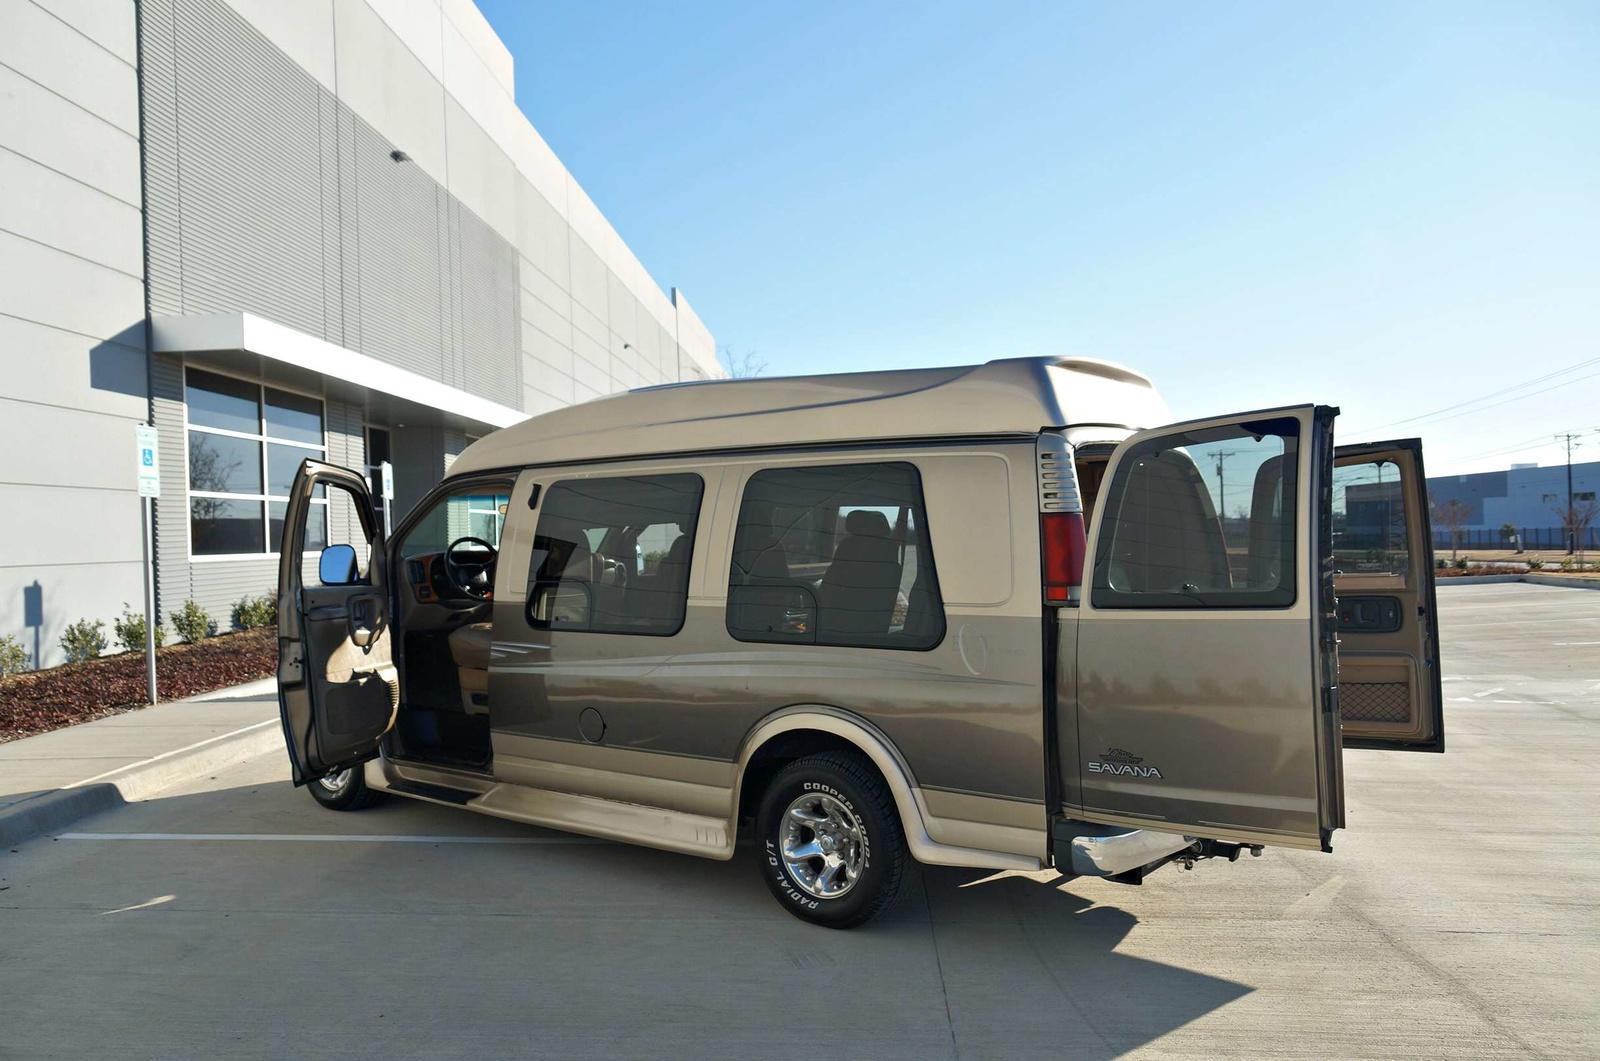 2007 gmc savana passenger van